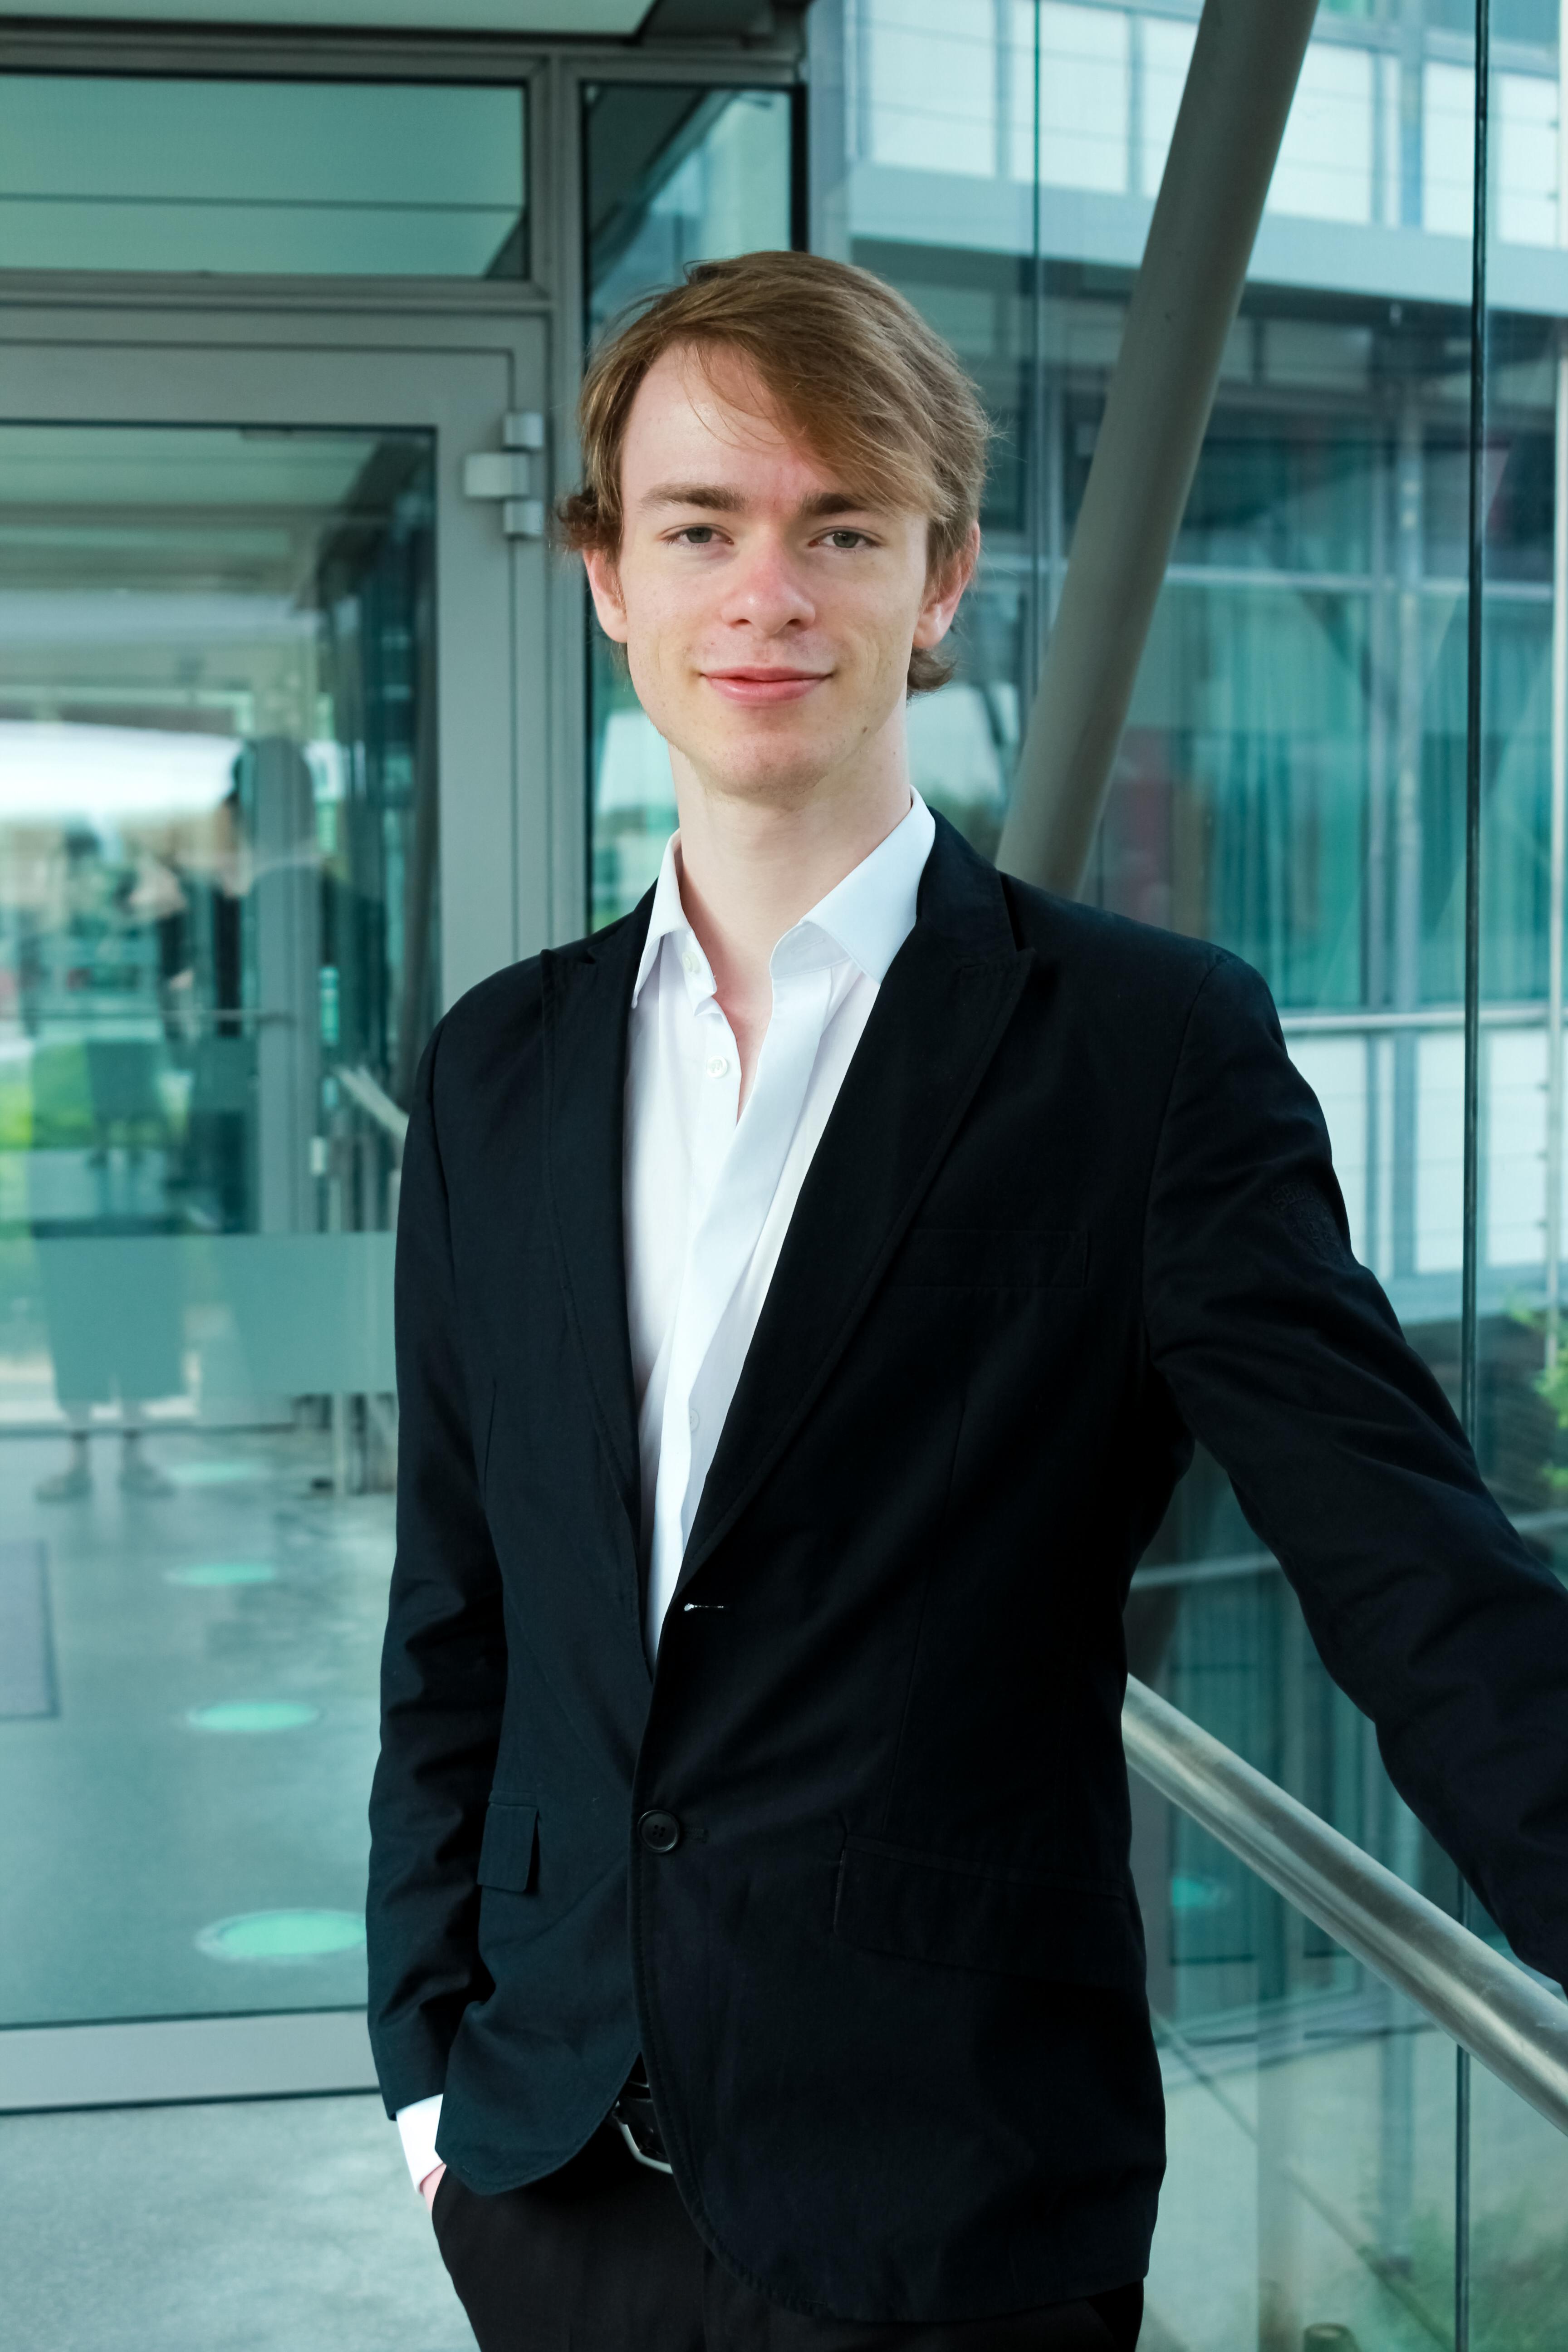 Marcel Boss - damaliger Vorstand Internes bei JBB